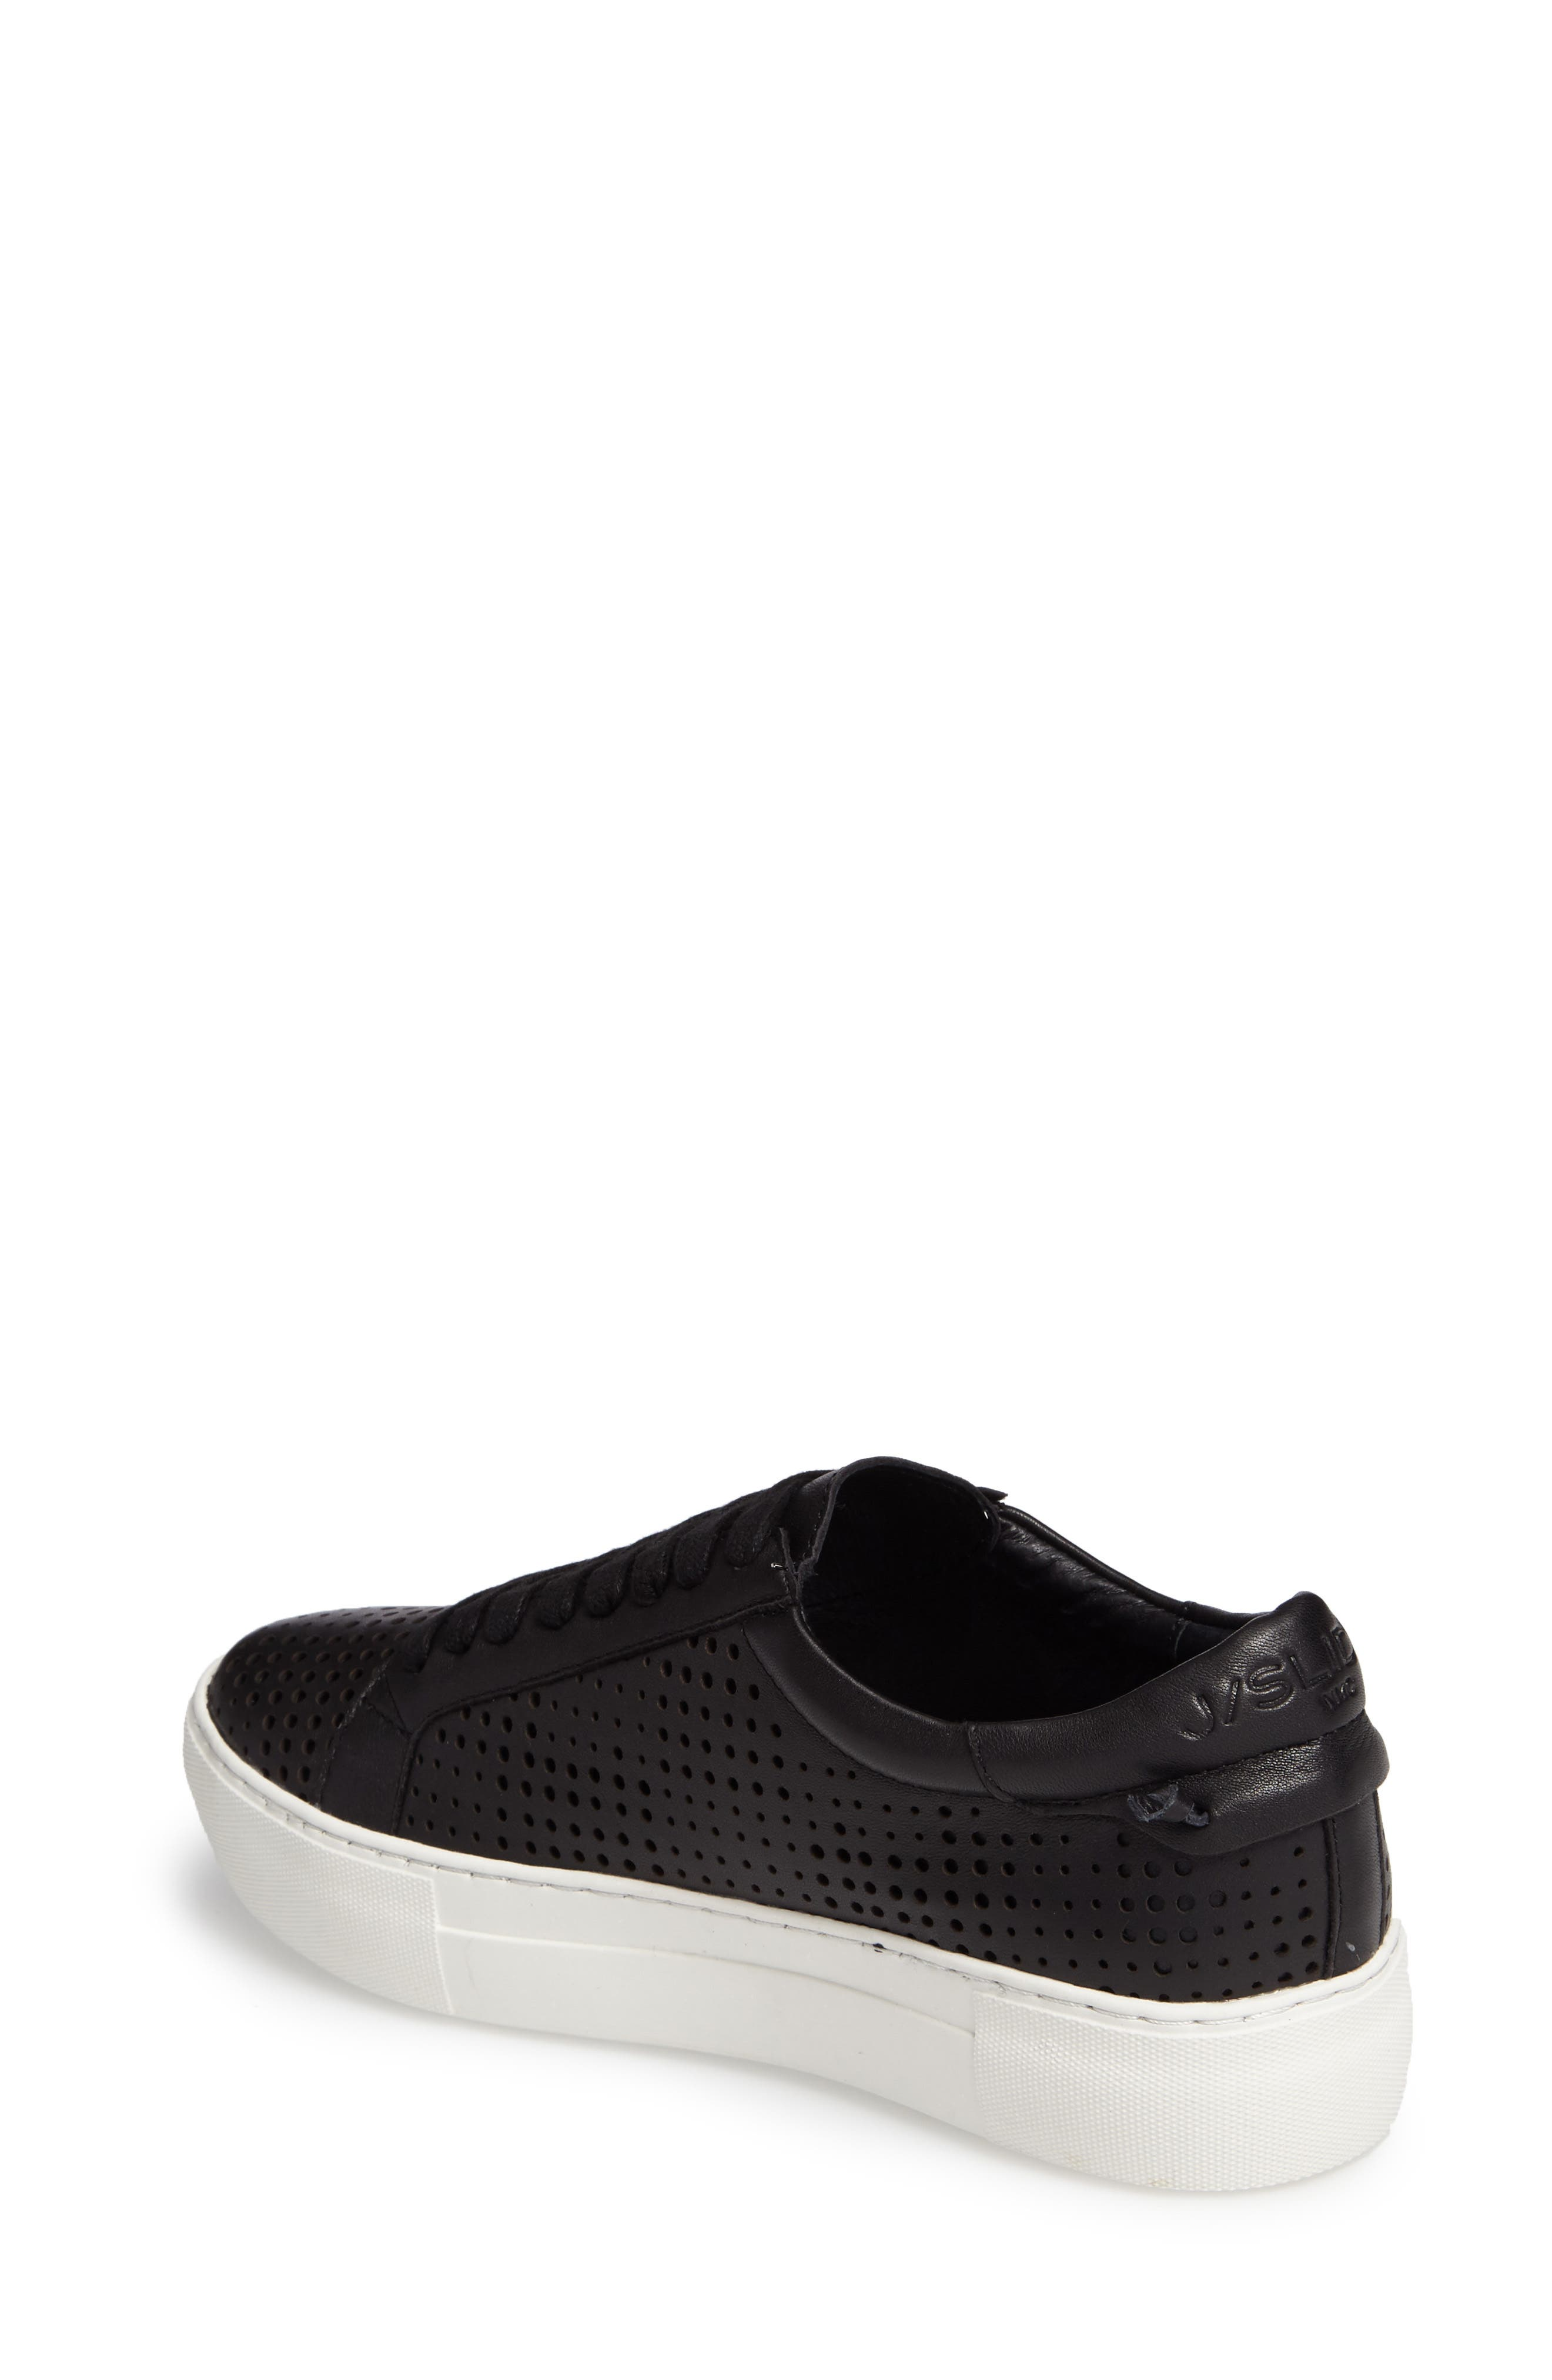 Audrina Platform Sneaker,                             Alternate thumbnail 2, color,                             Black Leather